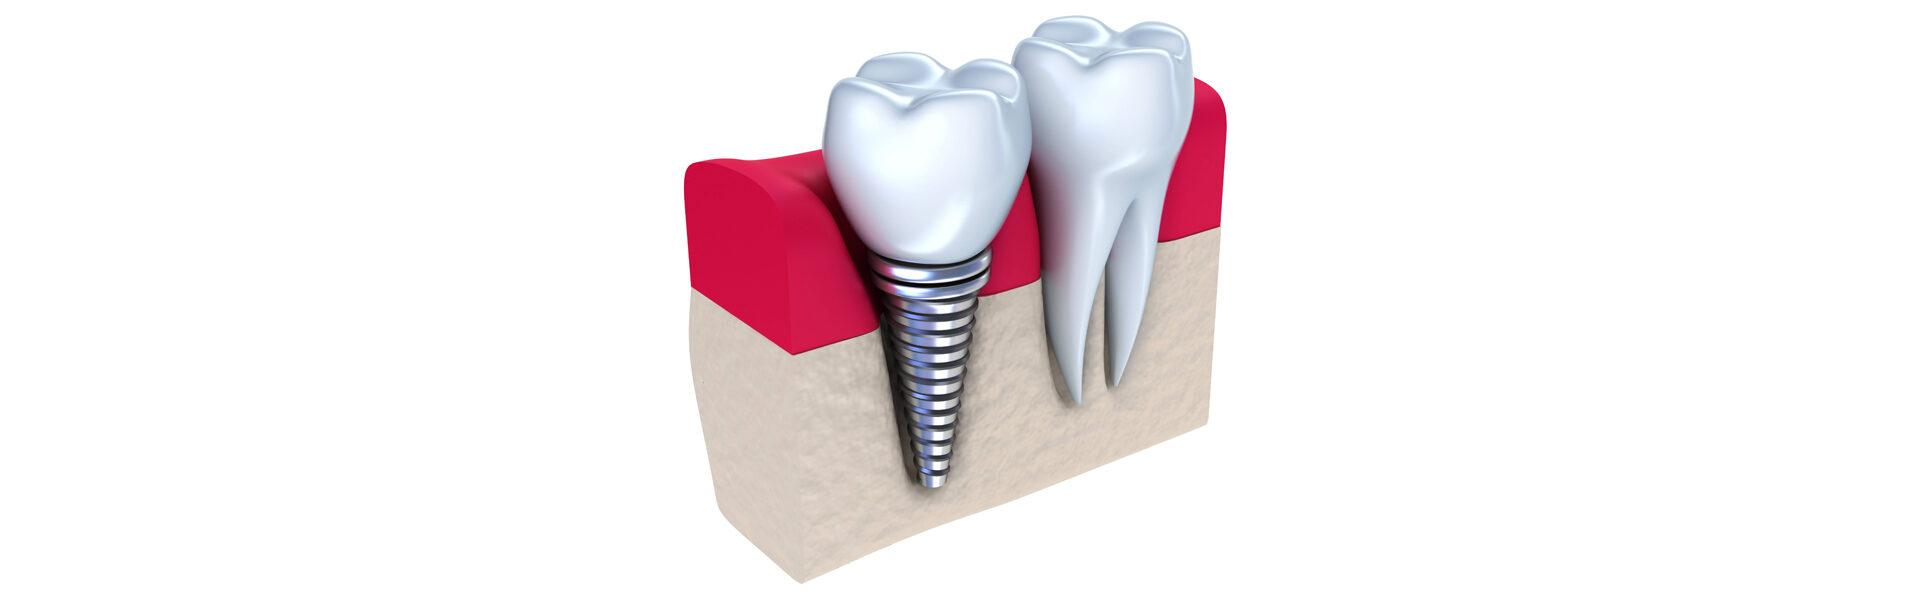 Implants in Waterford, MI